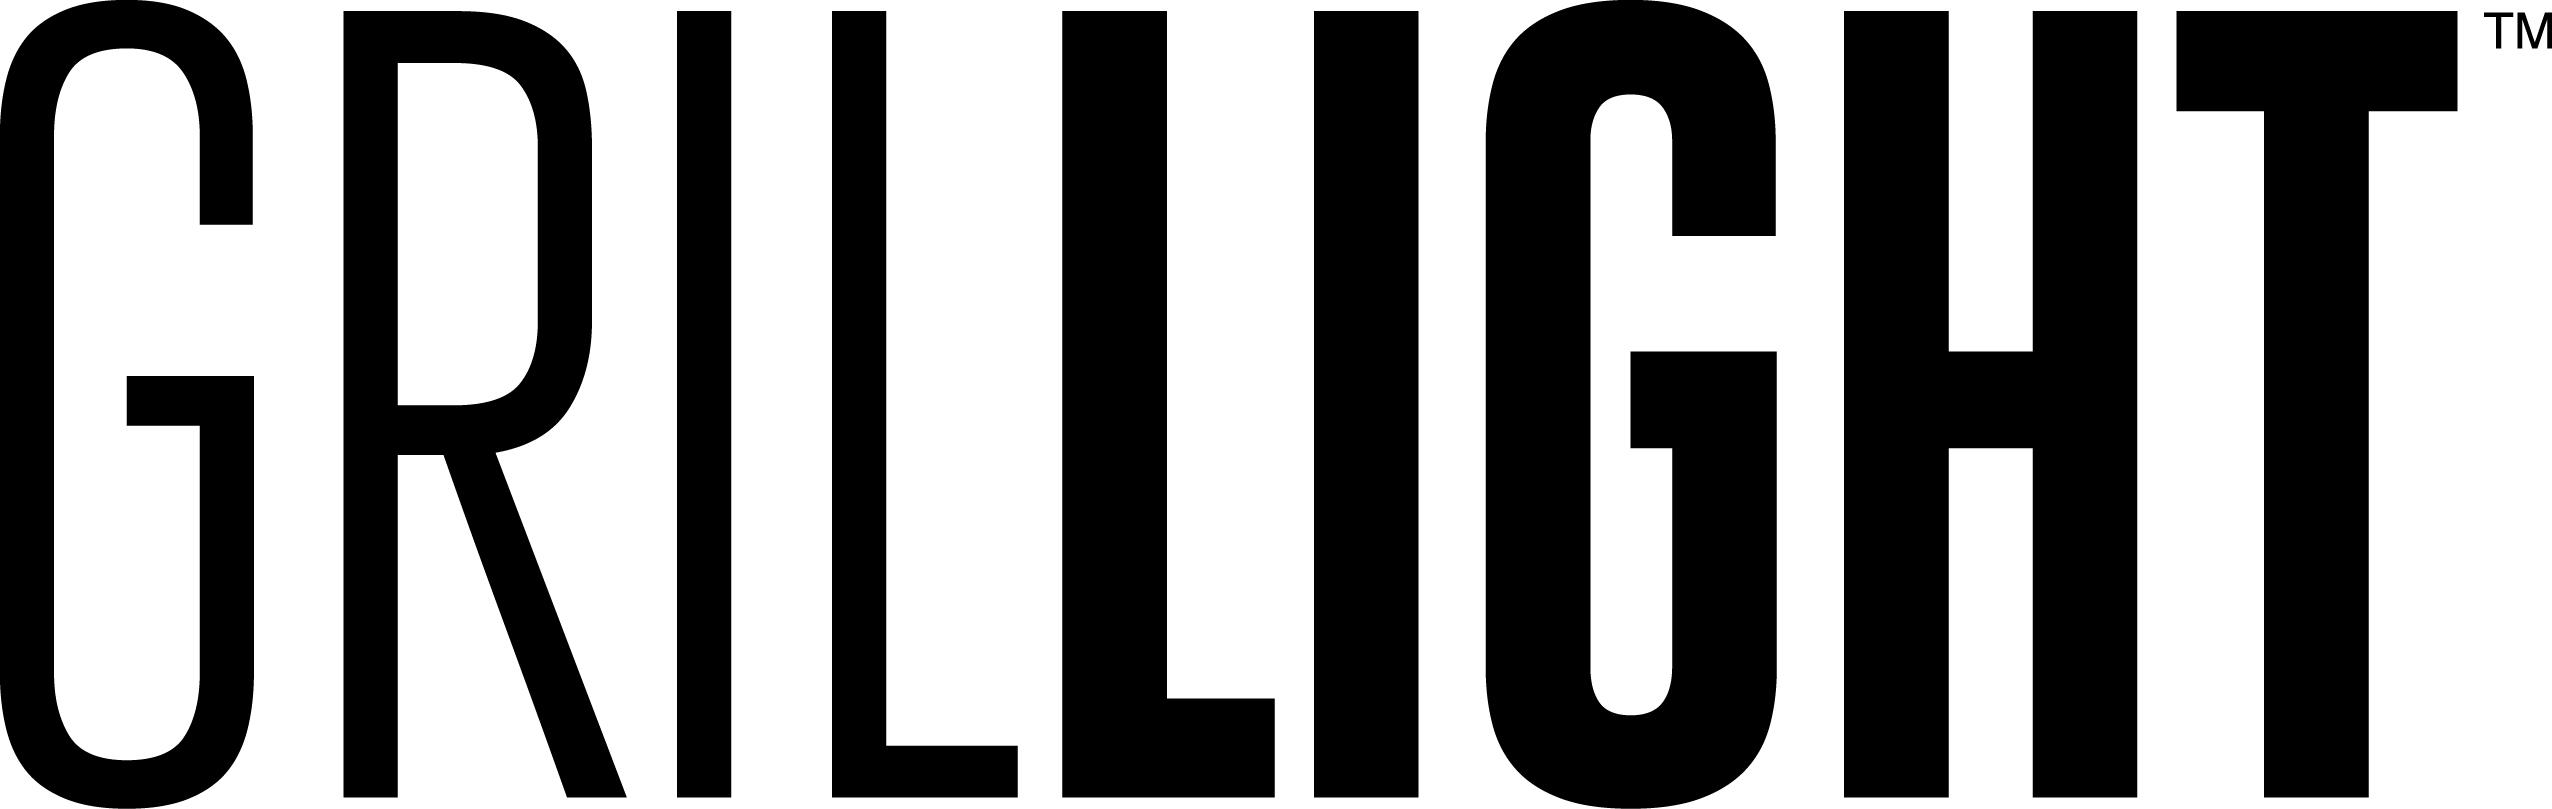 Grillight logo